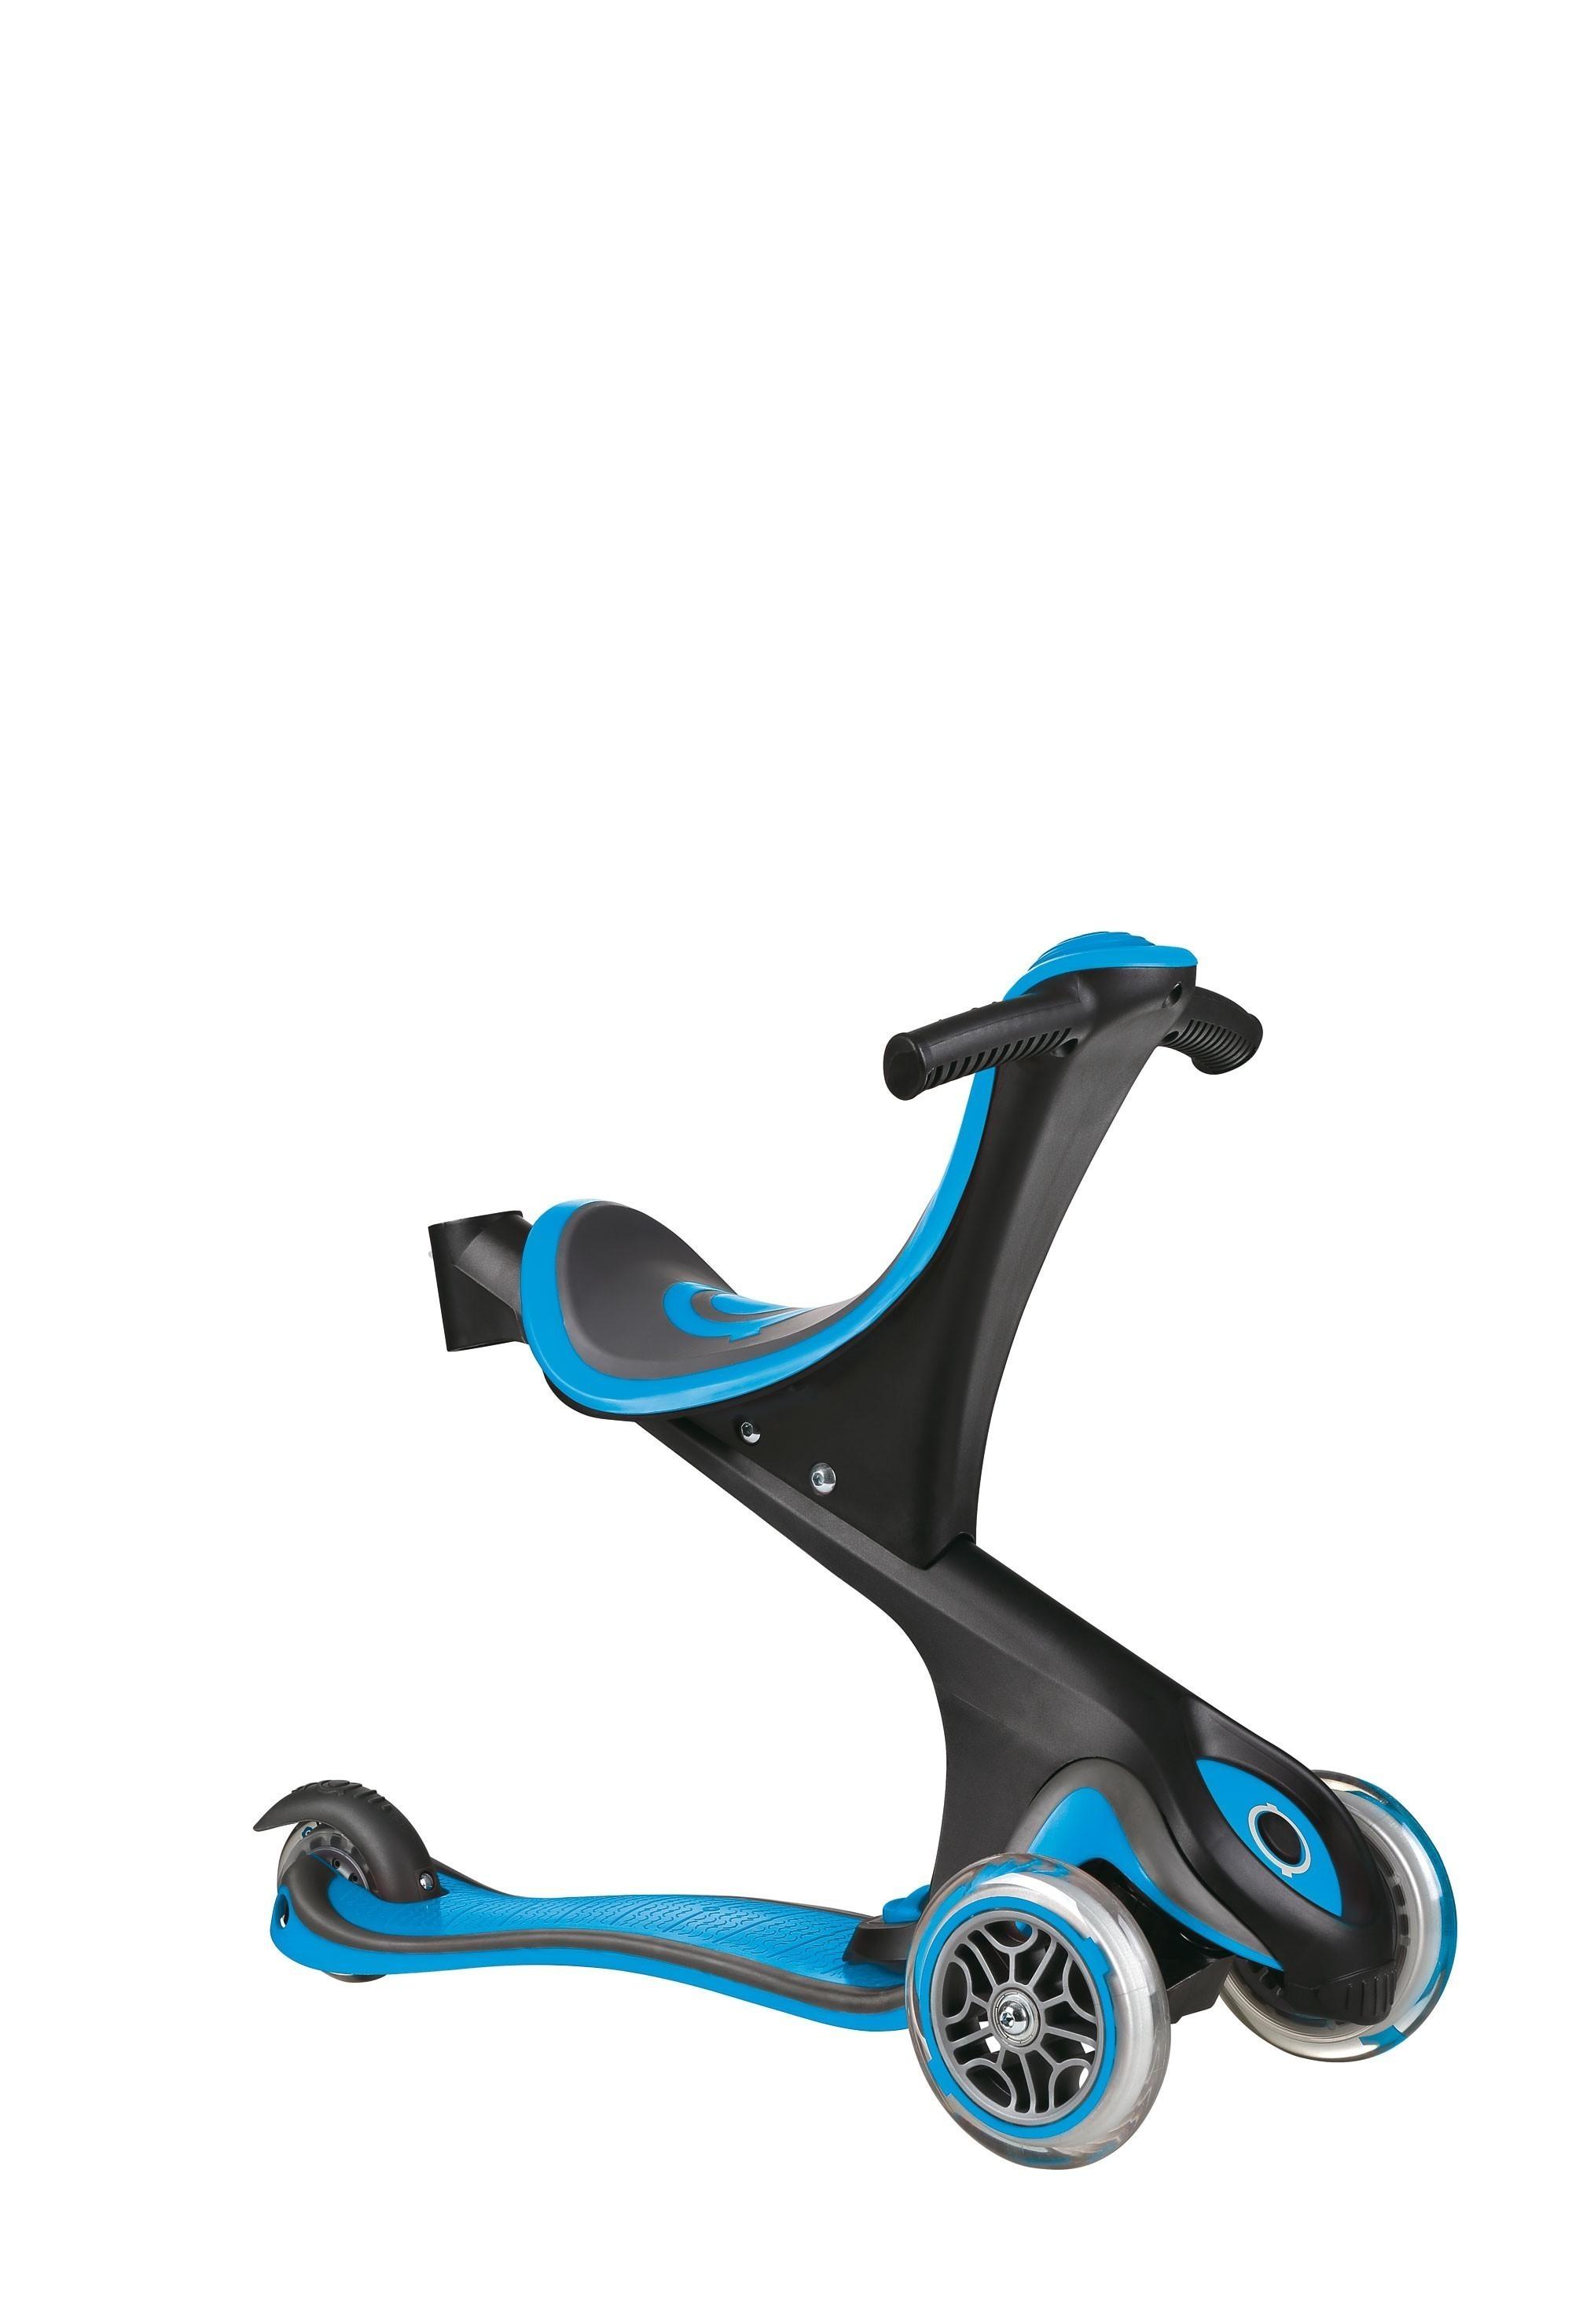 Scooter Kinderroller Dreirad Laufrad Globber Evo Comfort 5in1 himmelbl Bild 2